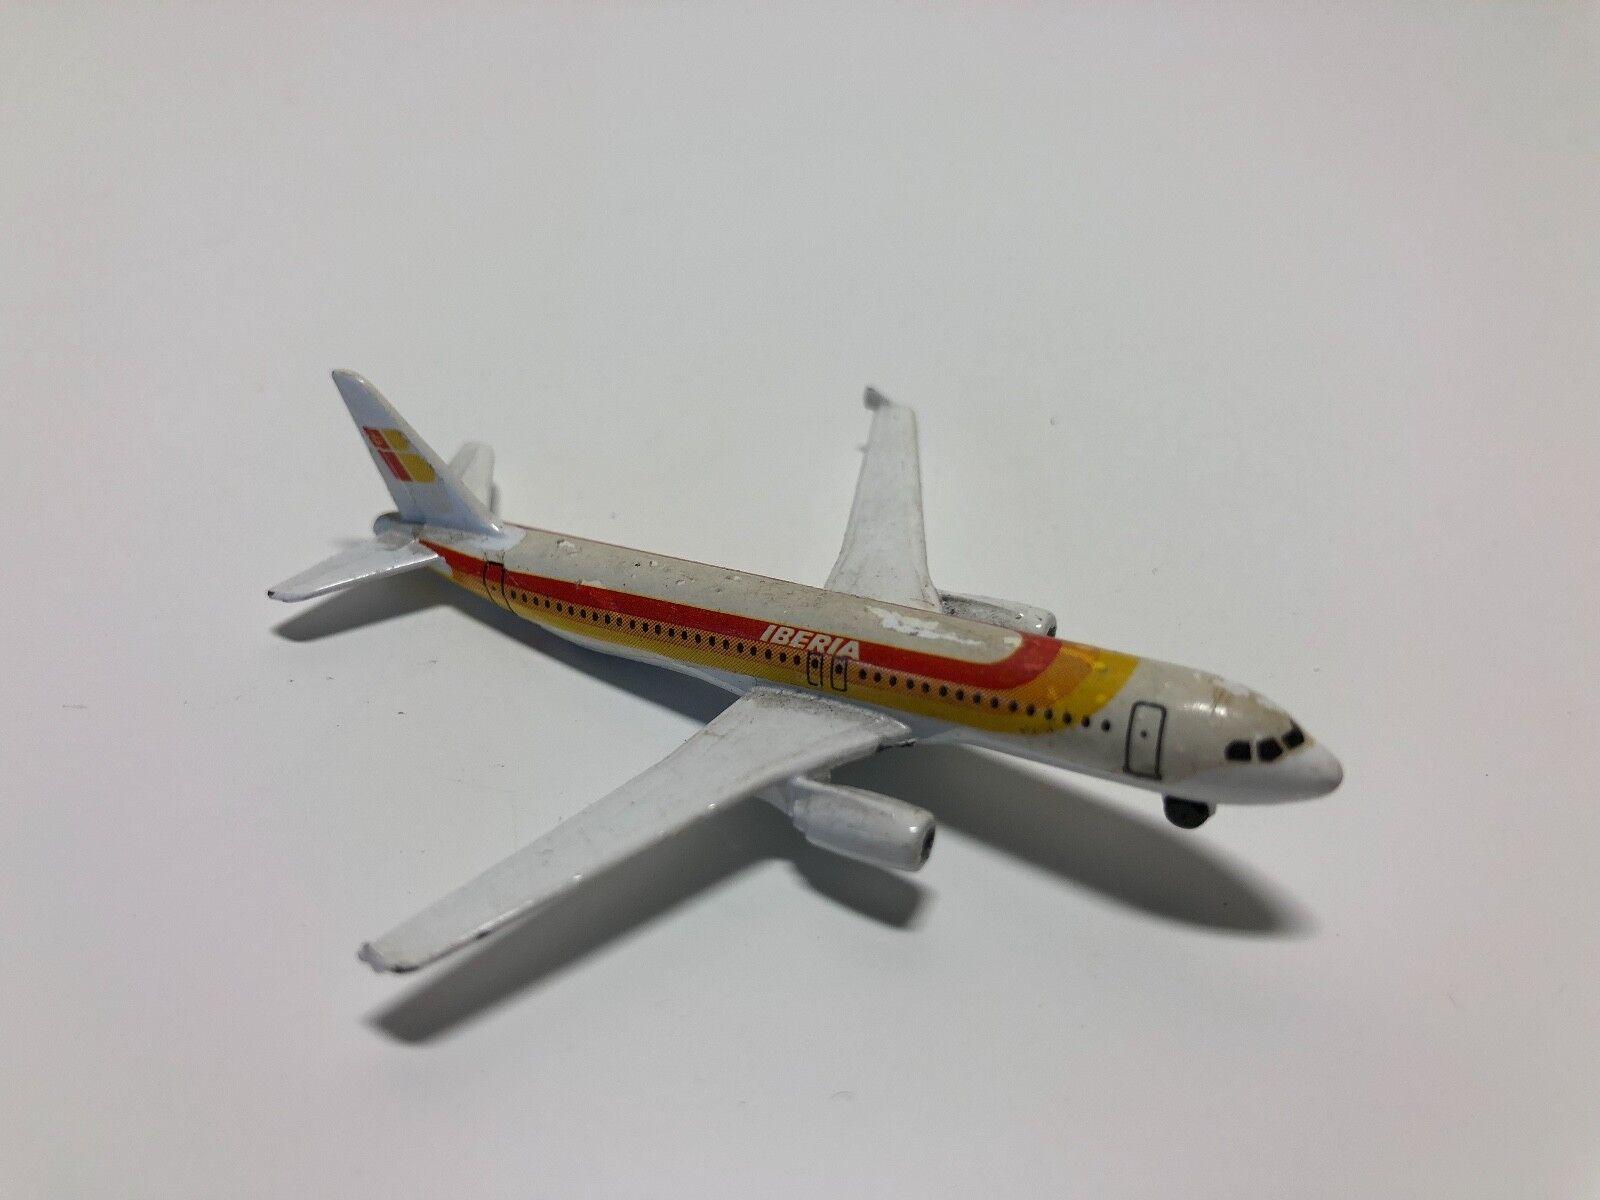 Usado - Miniatura Avion IBERIA - Airbus A320 - SCHABAK - Airplane